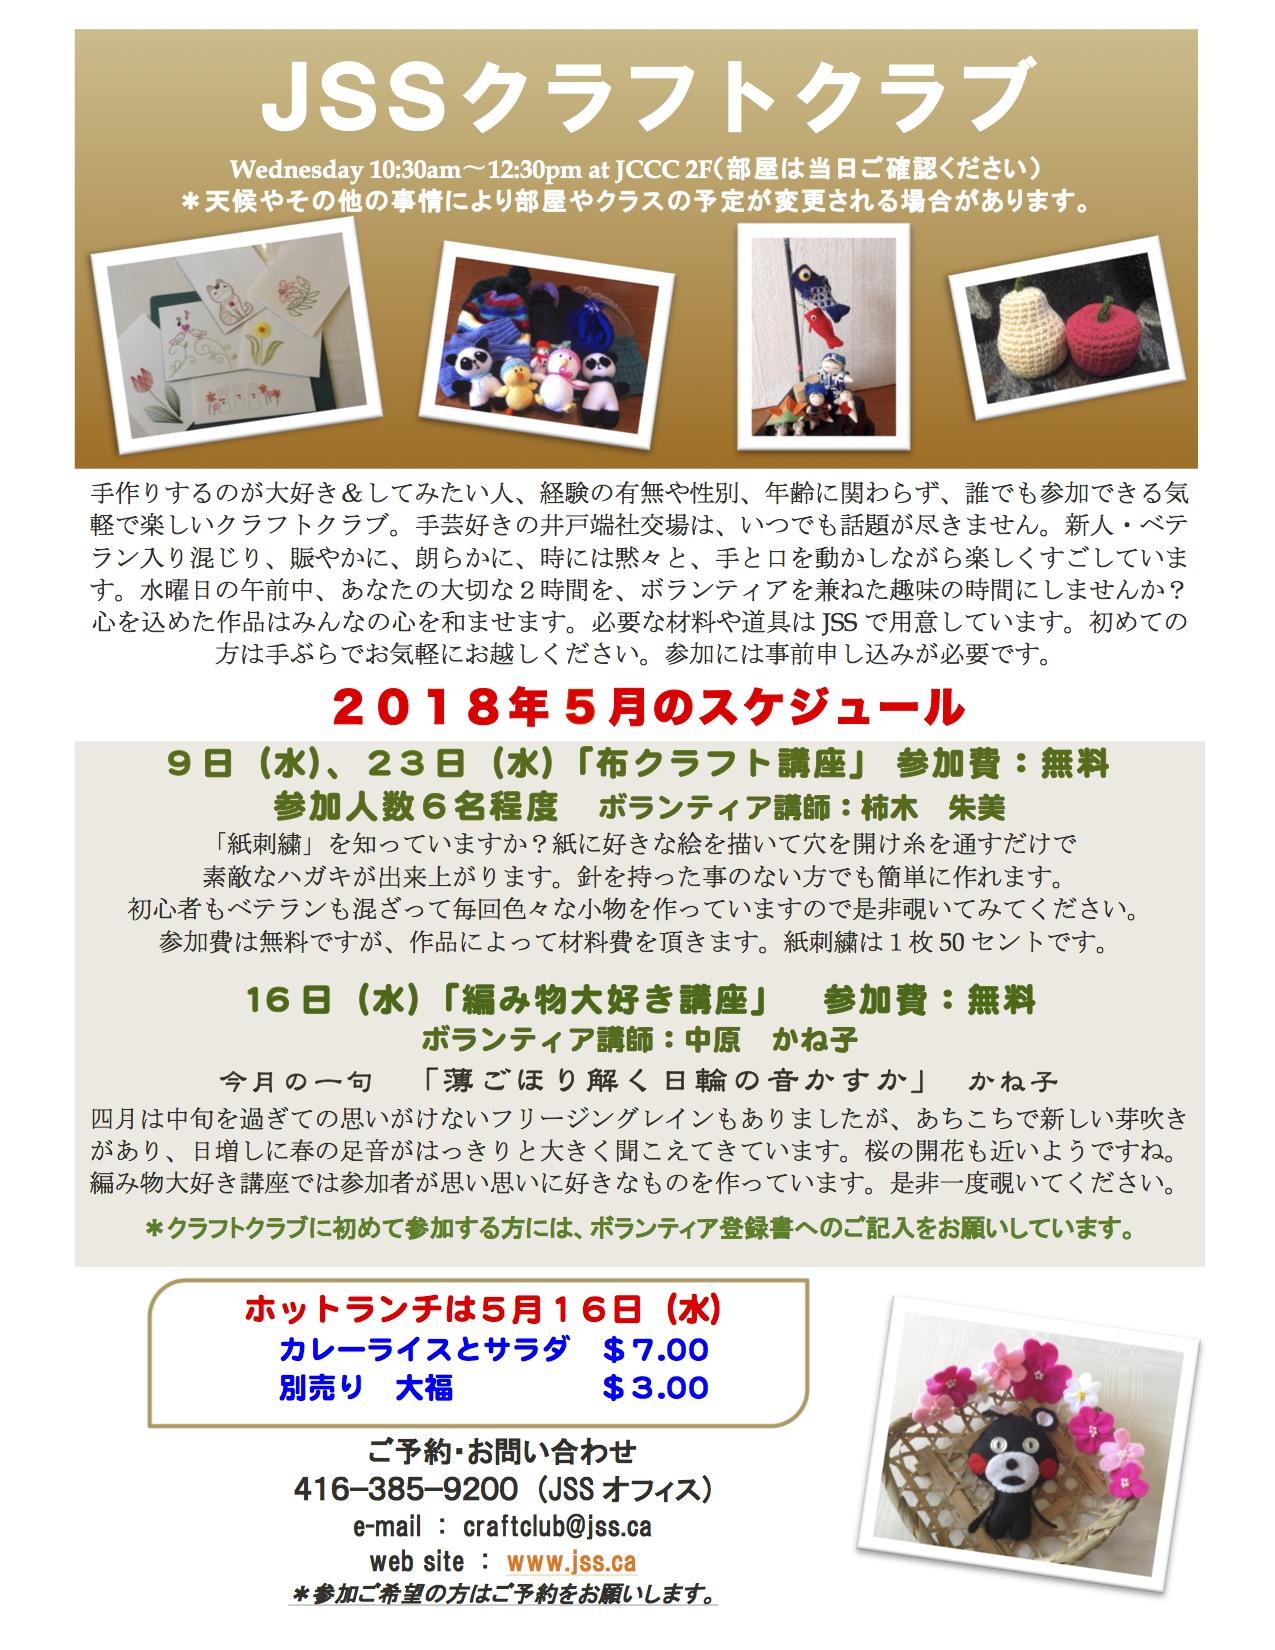 [:ja]JSS クラフトクラブ5月の予定[:en]JSS Craft Club Schedule - May[:]